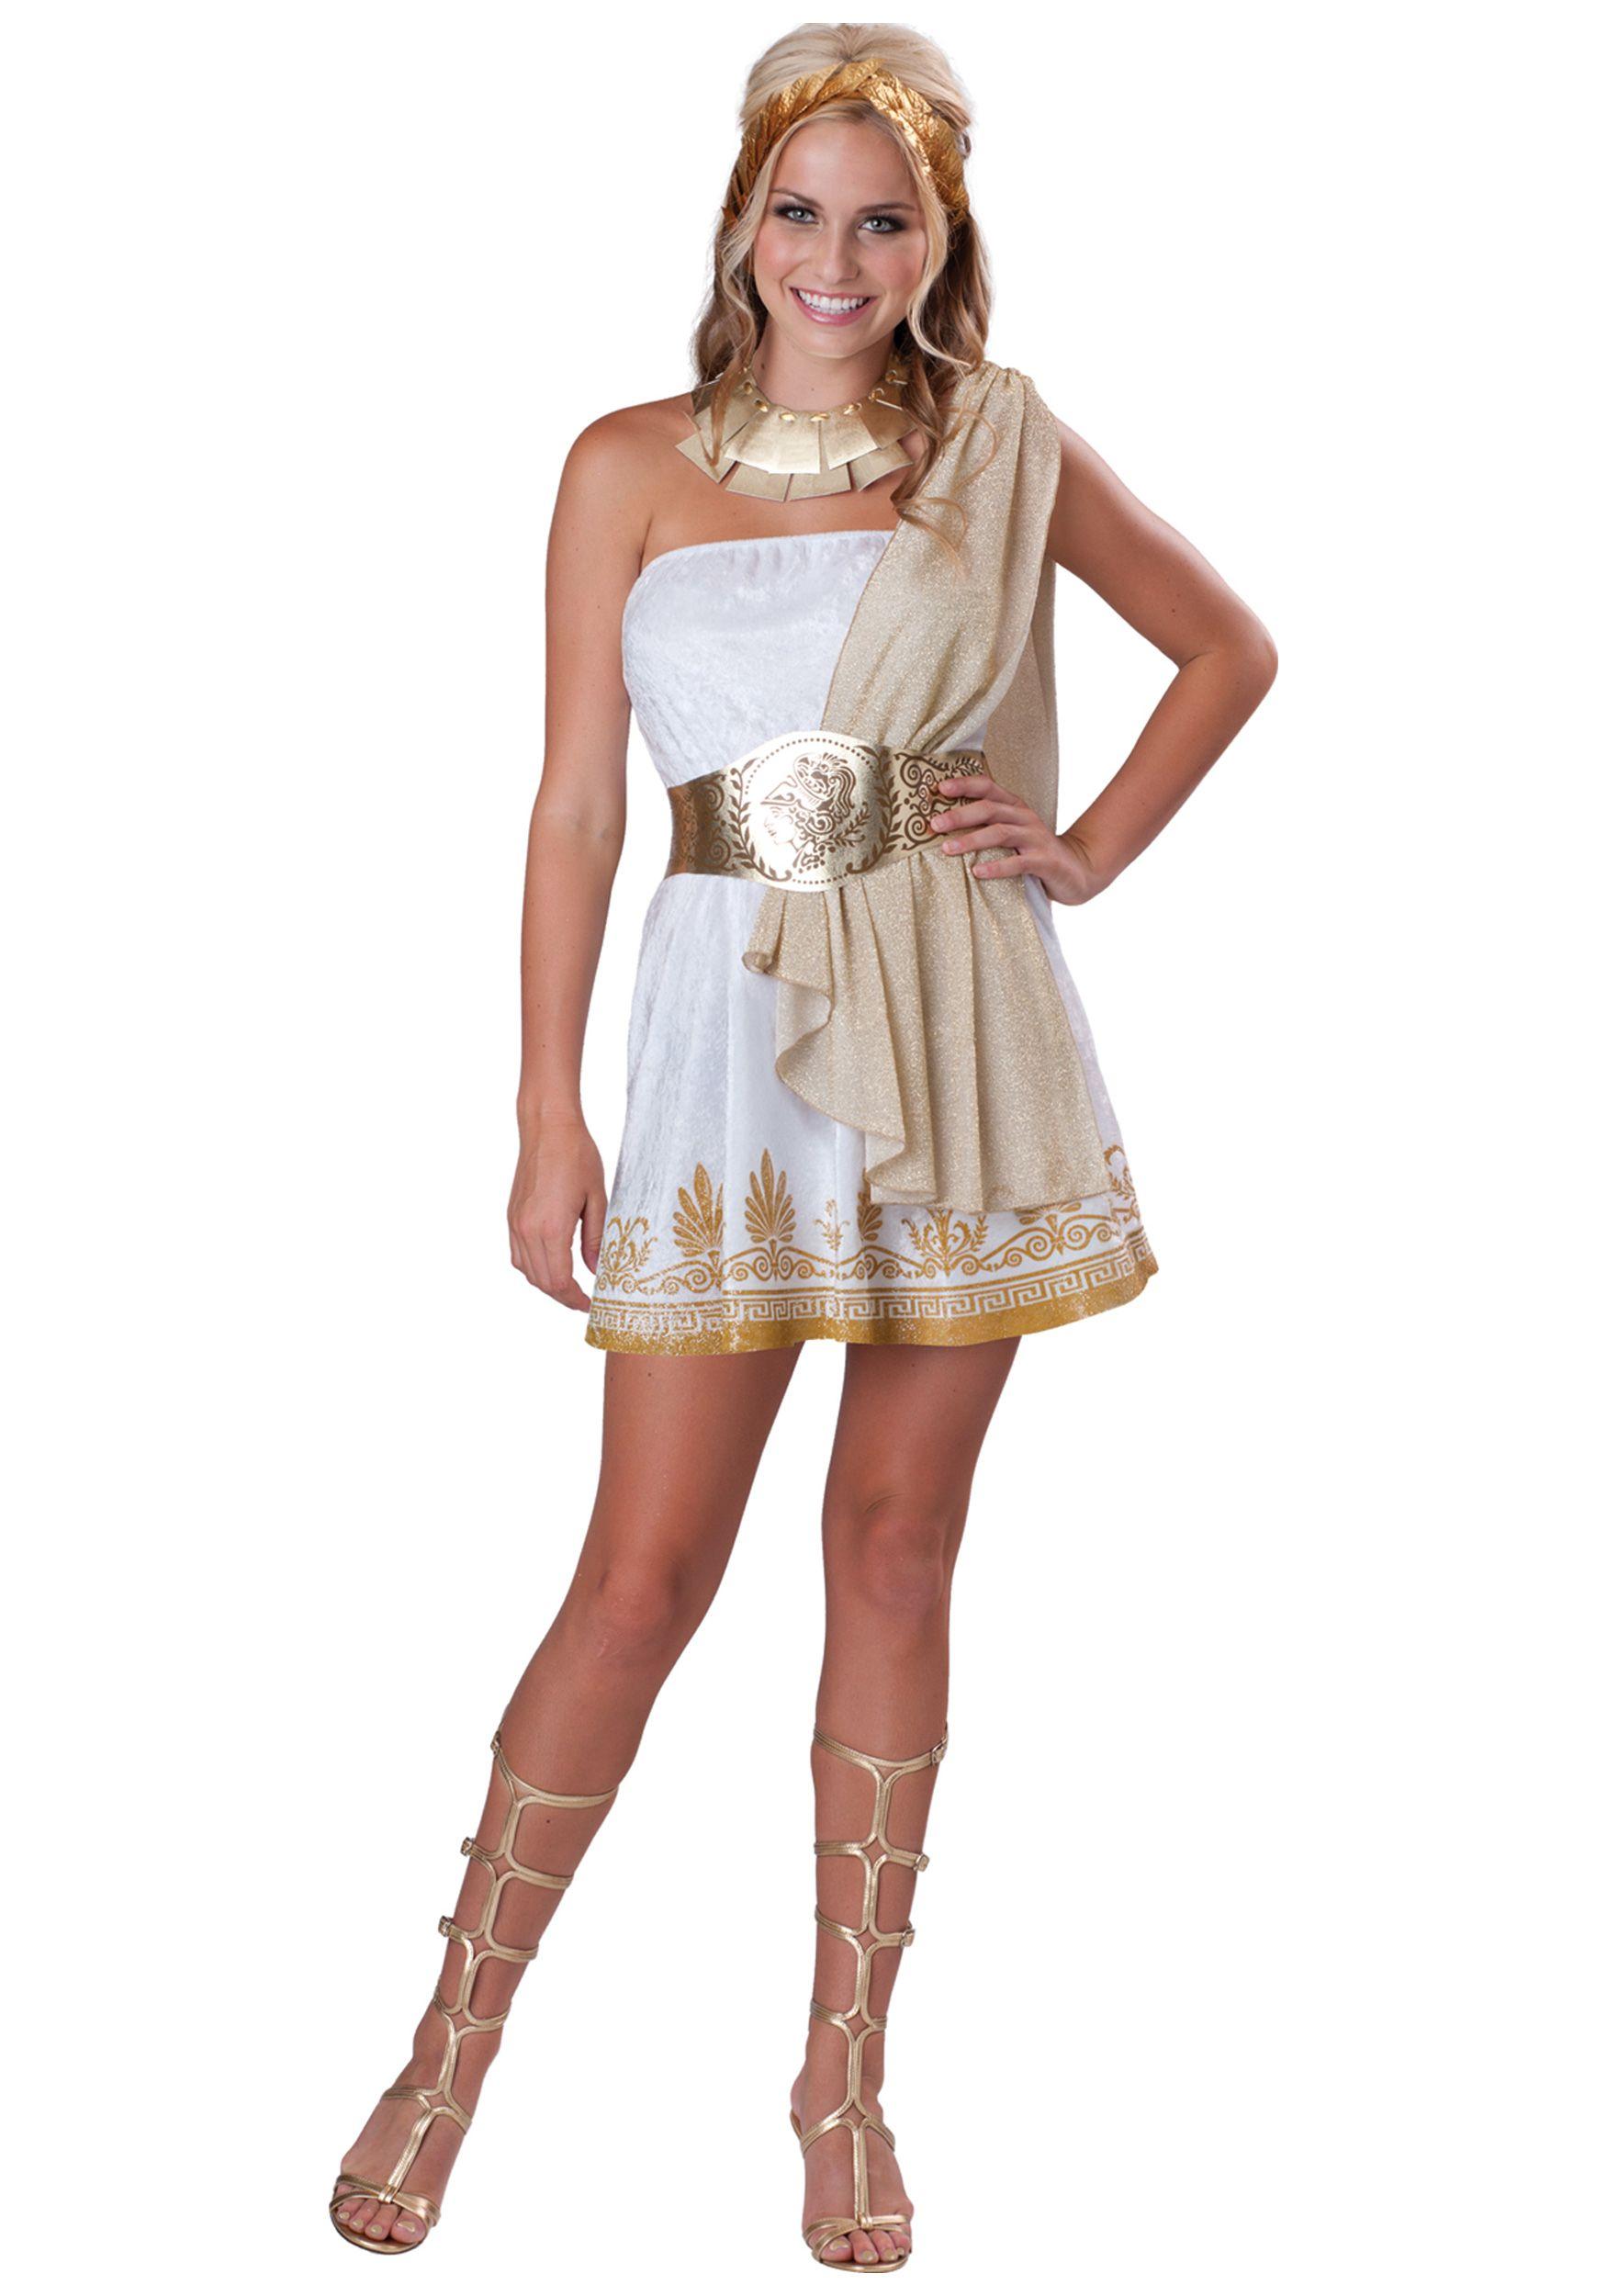 Glitzy Teen Girl Goddess Costume   Historical costume, Halloween ...